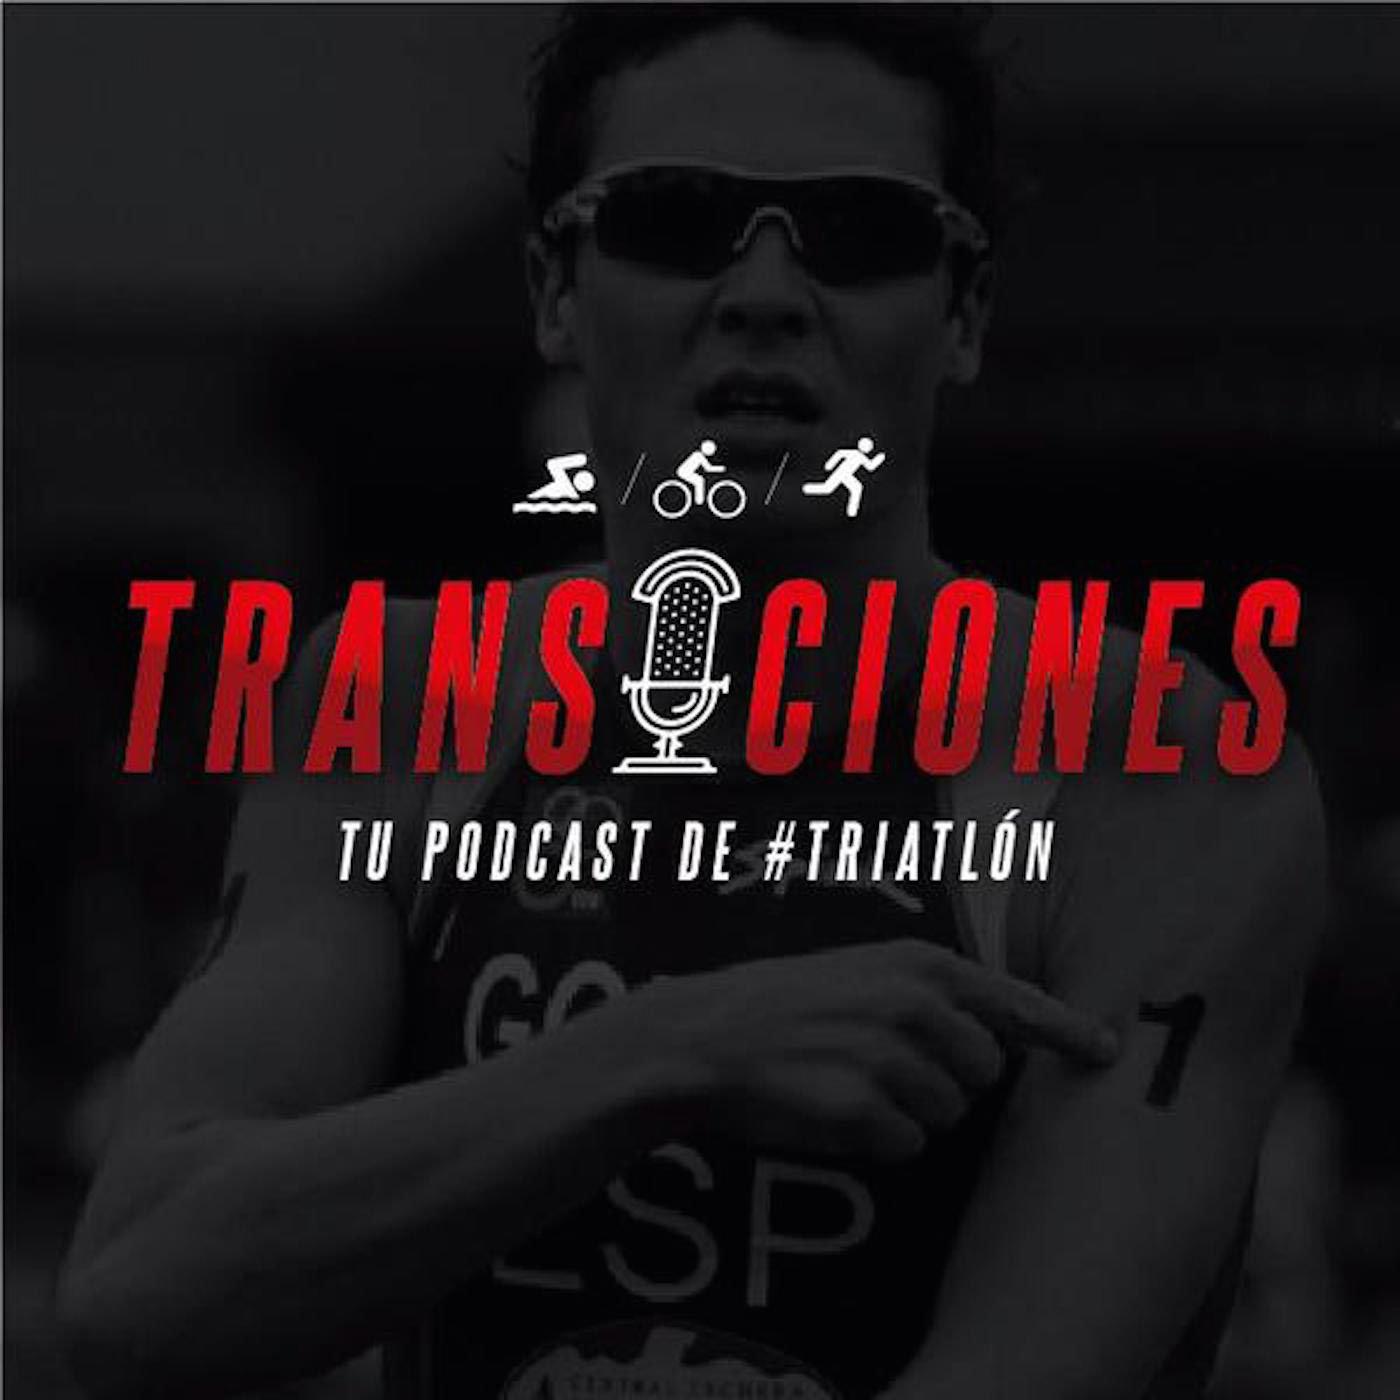 <![CDATA[Transiciones, tu podcast semanal de triatlón]]>